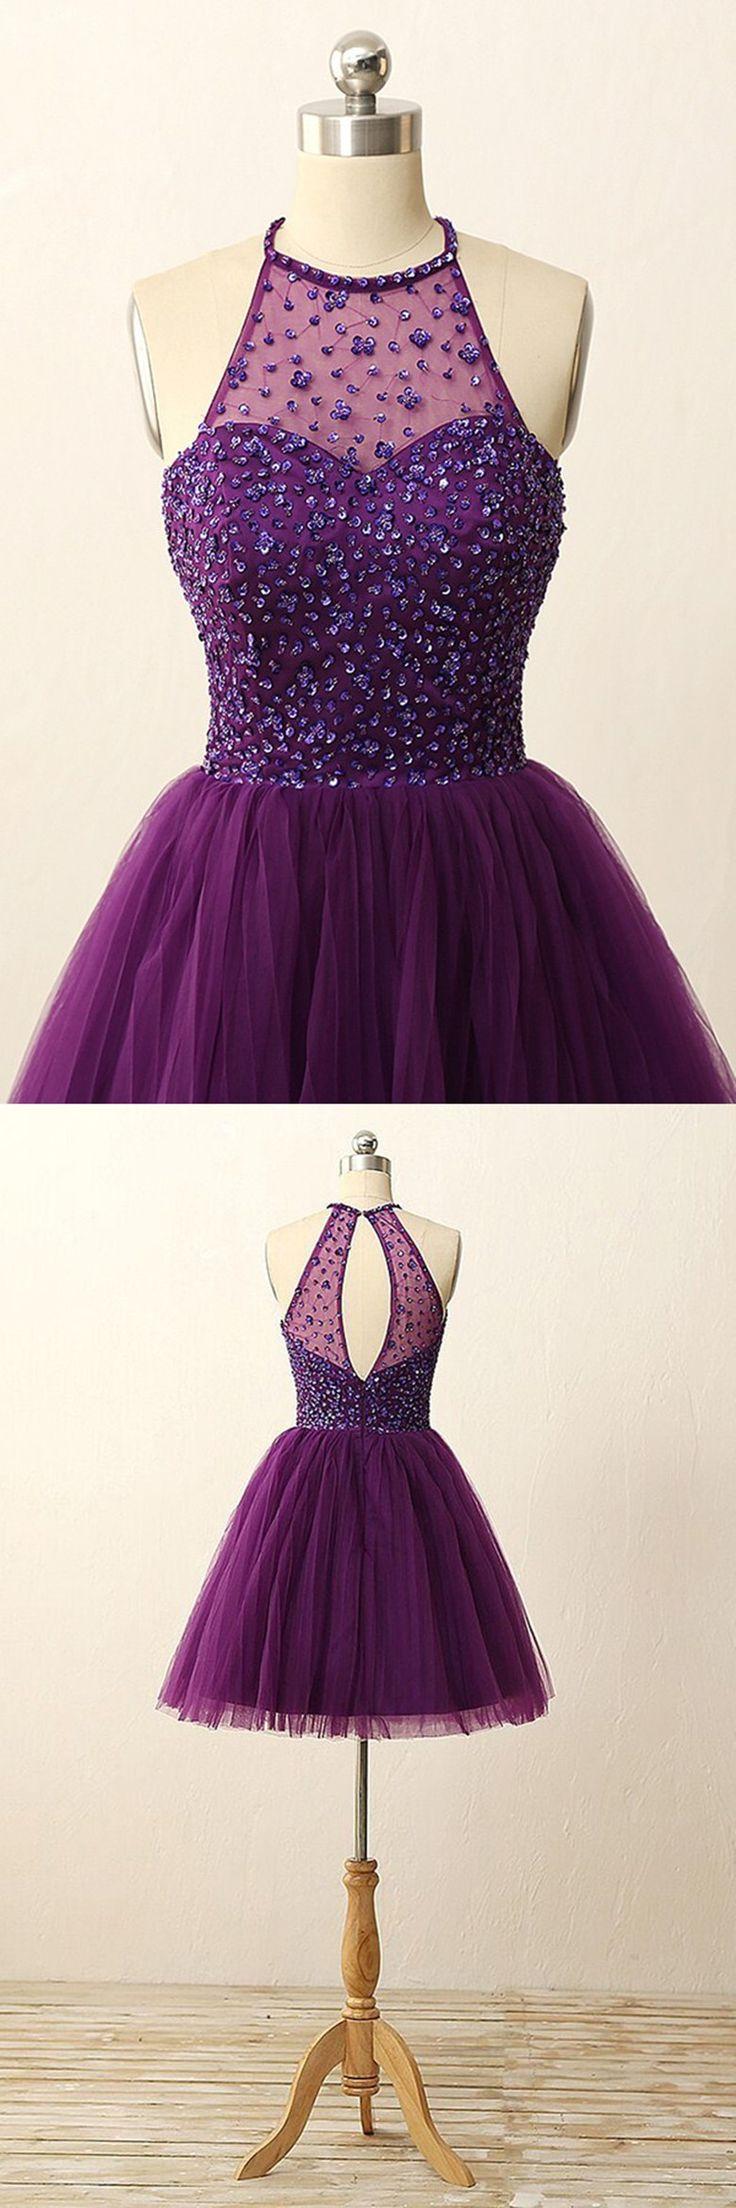 2016 homecoming dress,purple homecoming dress,halter homecoming dress,sparkly homecoming dress,short homecoming dress,sleeveless homecoming dress,elegant homecoming dress,homecoming dress with sequins